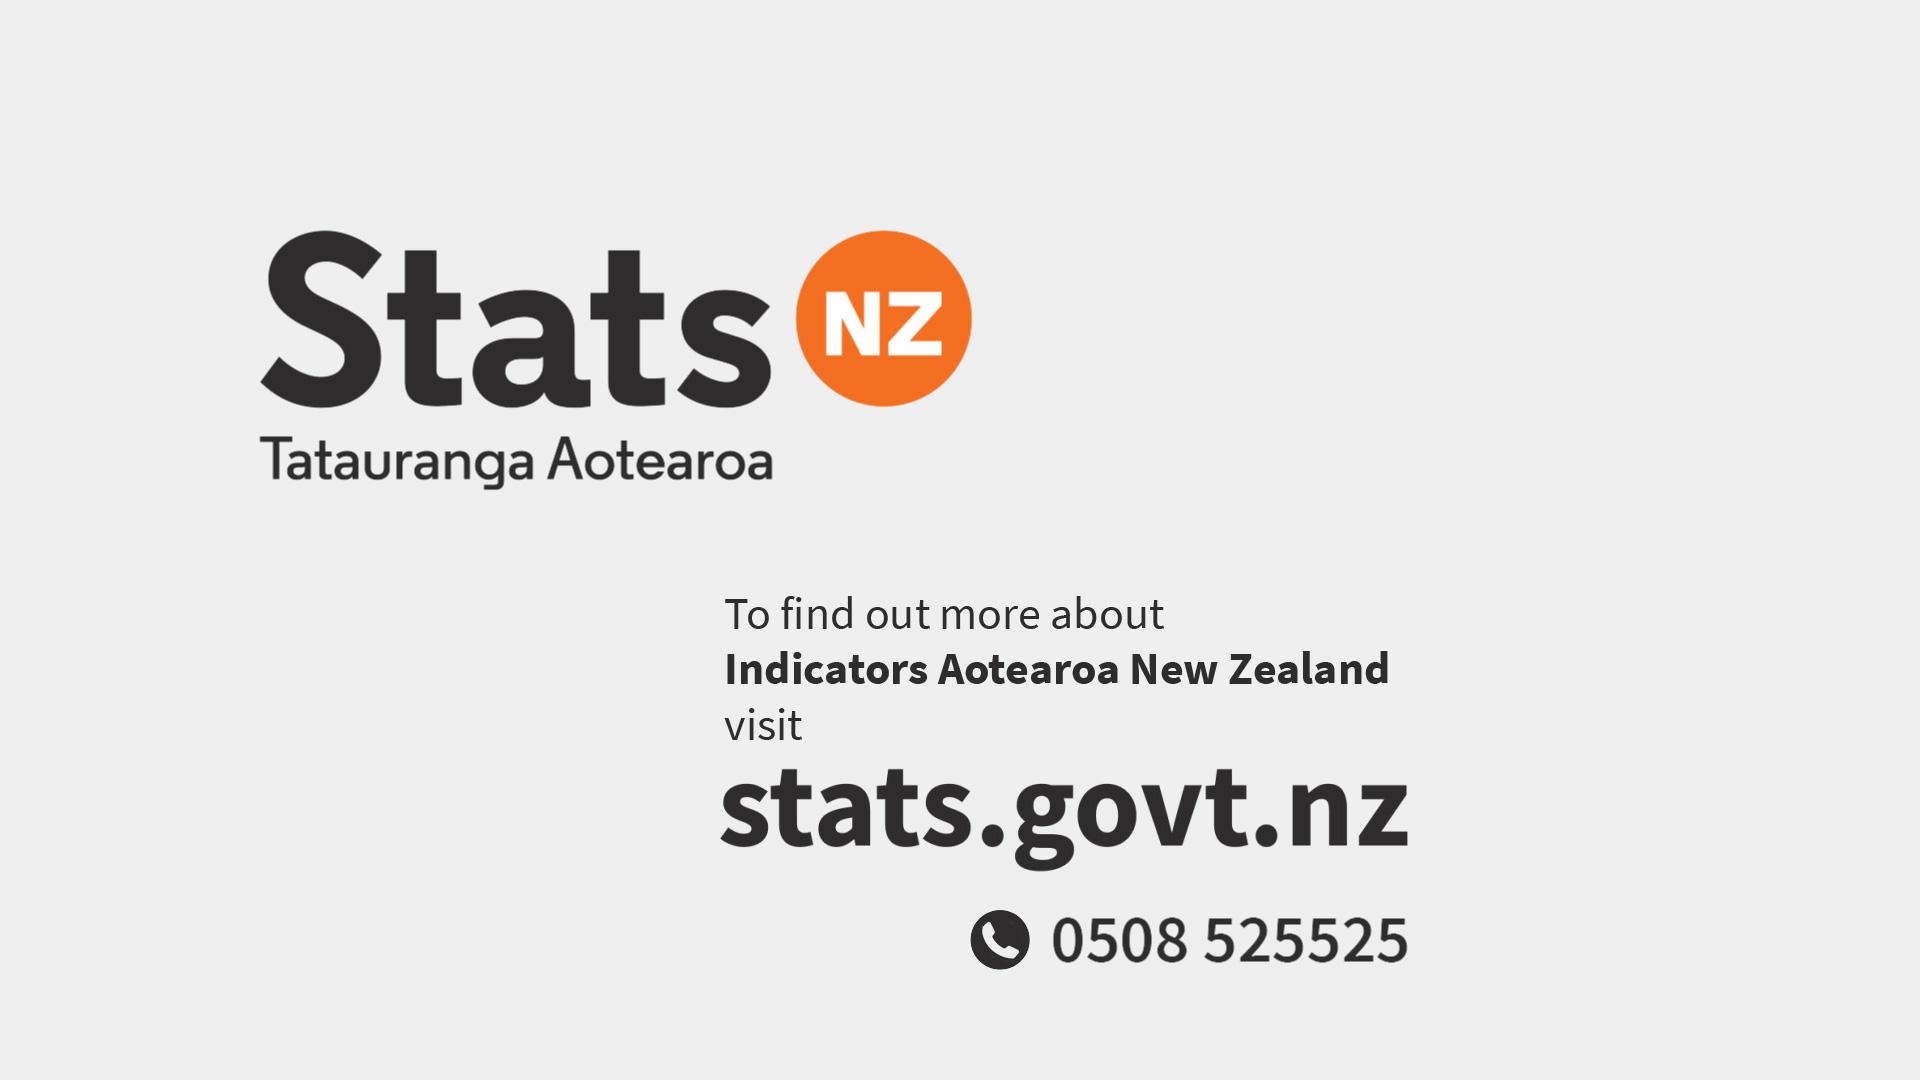 Stats NZ - Storyboard 04